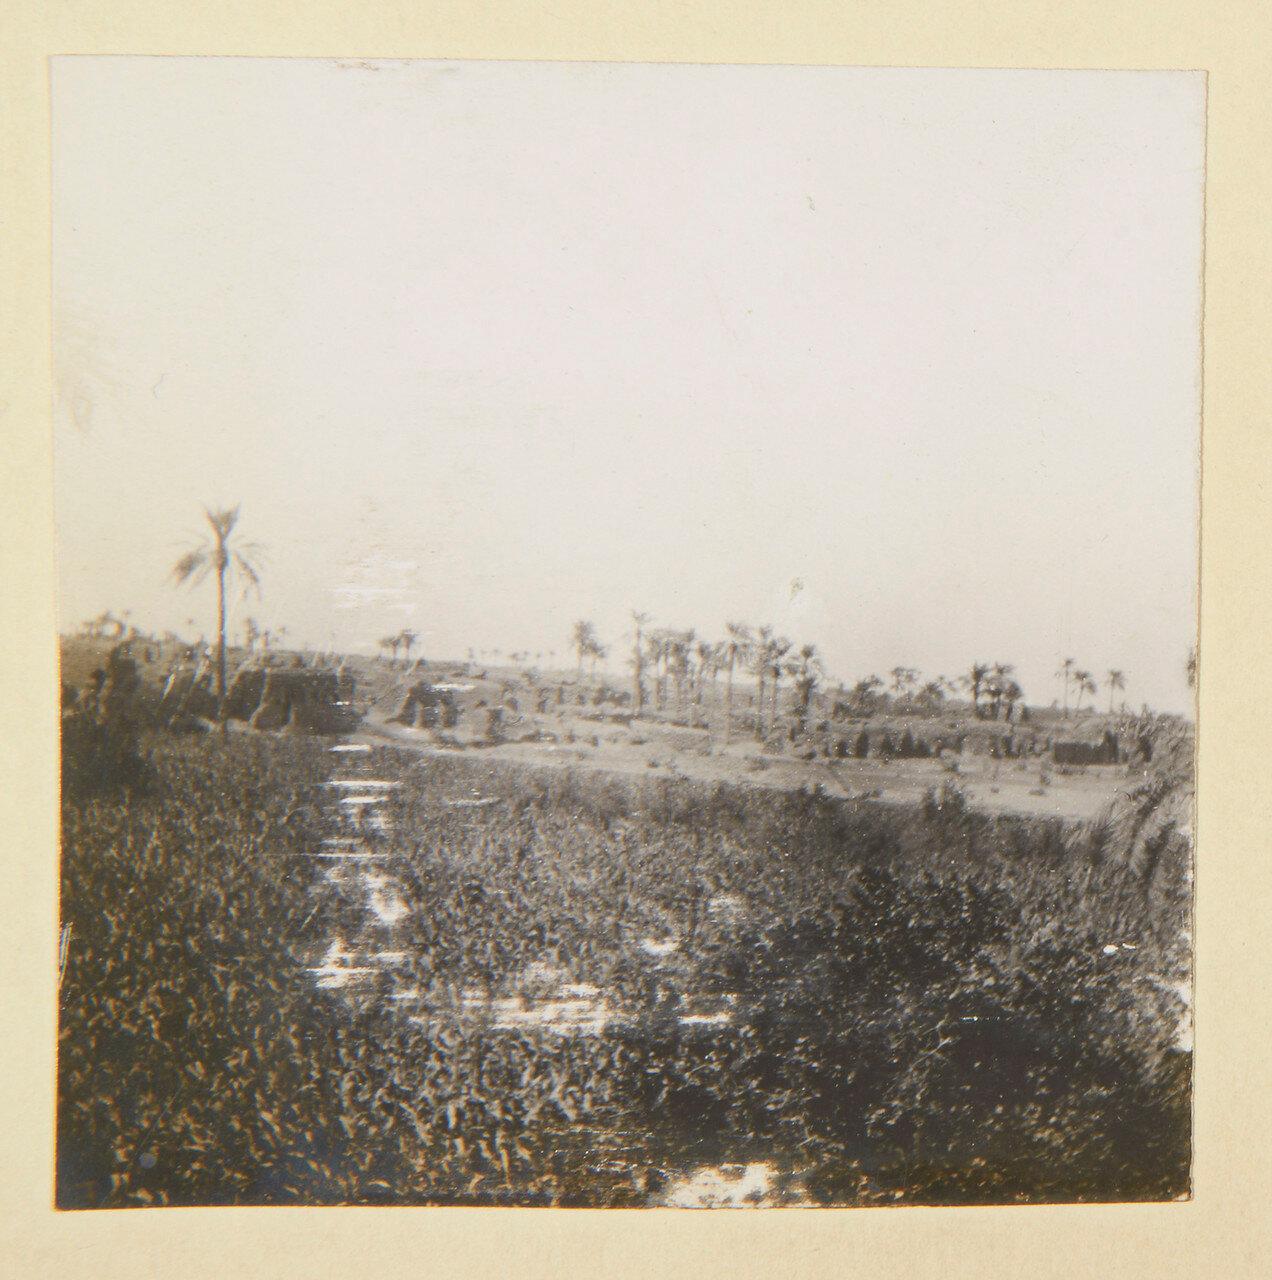 Август 1898. Покинутые деревни